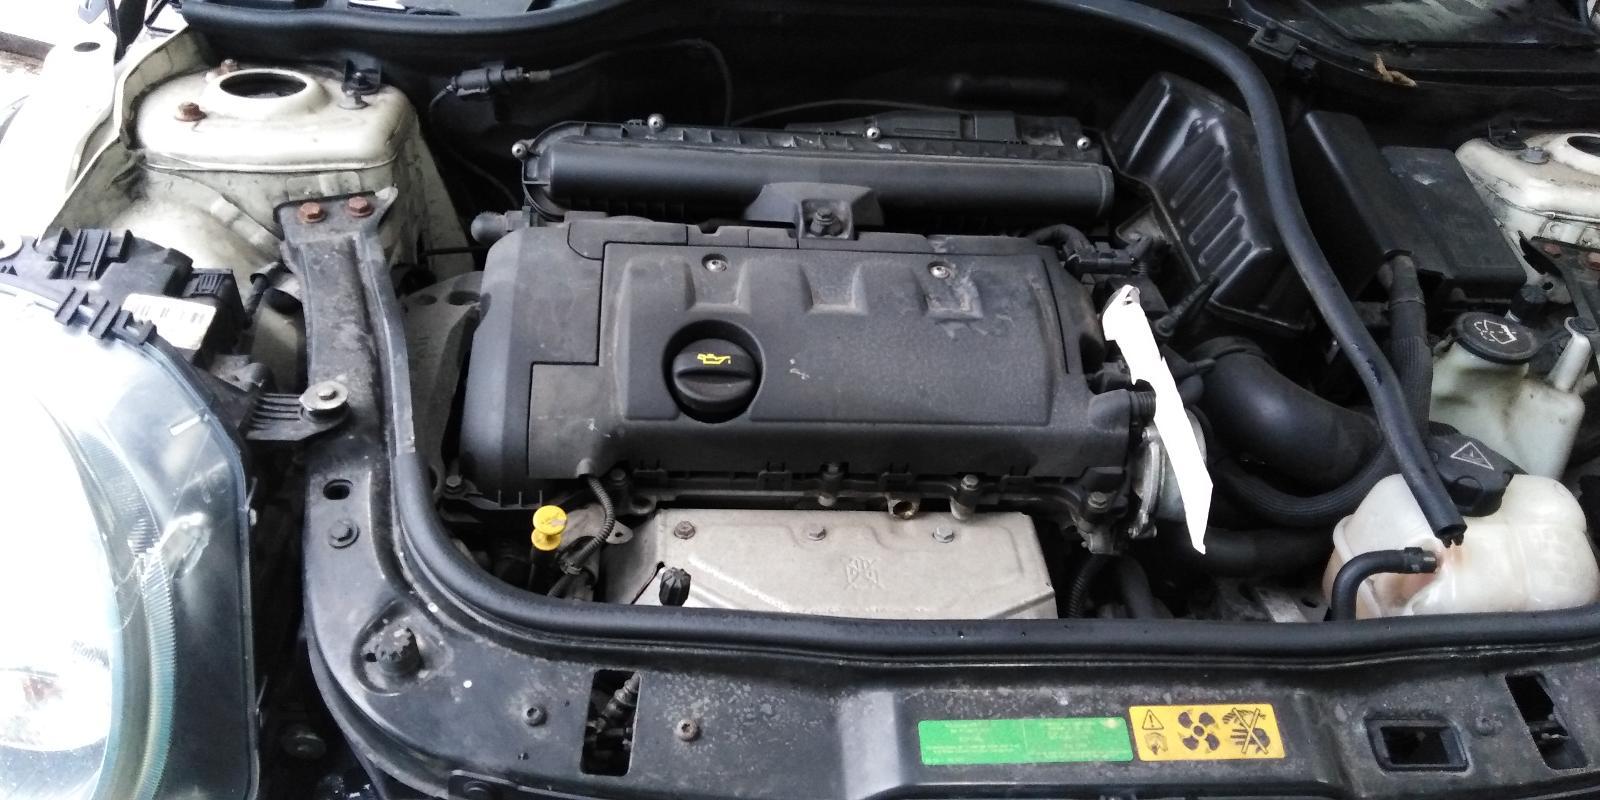 Image for a MINI (BMW) MINI 2009 3 Door Hatchback